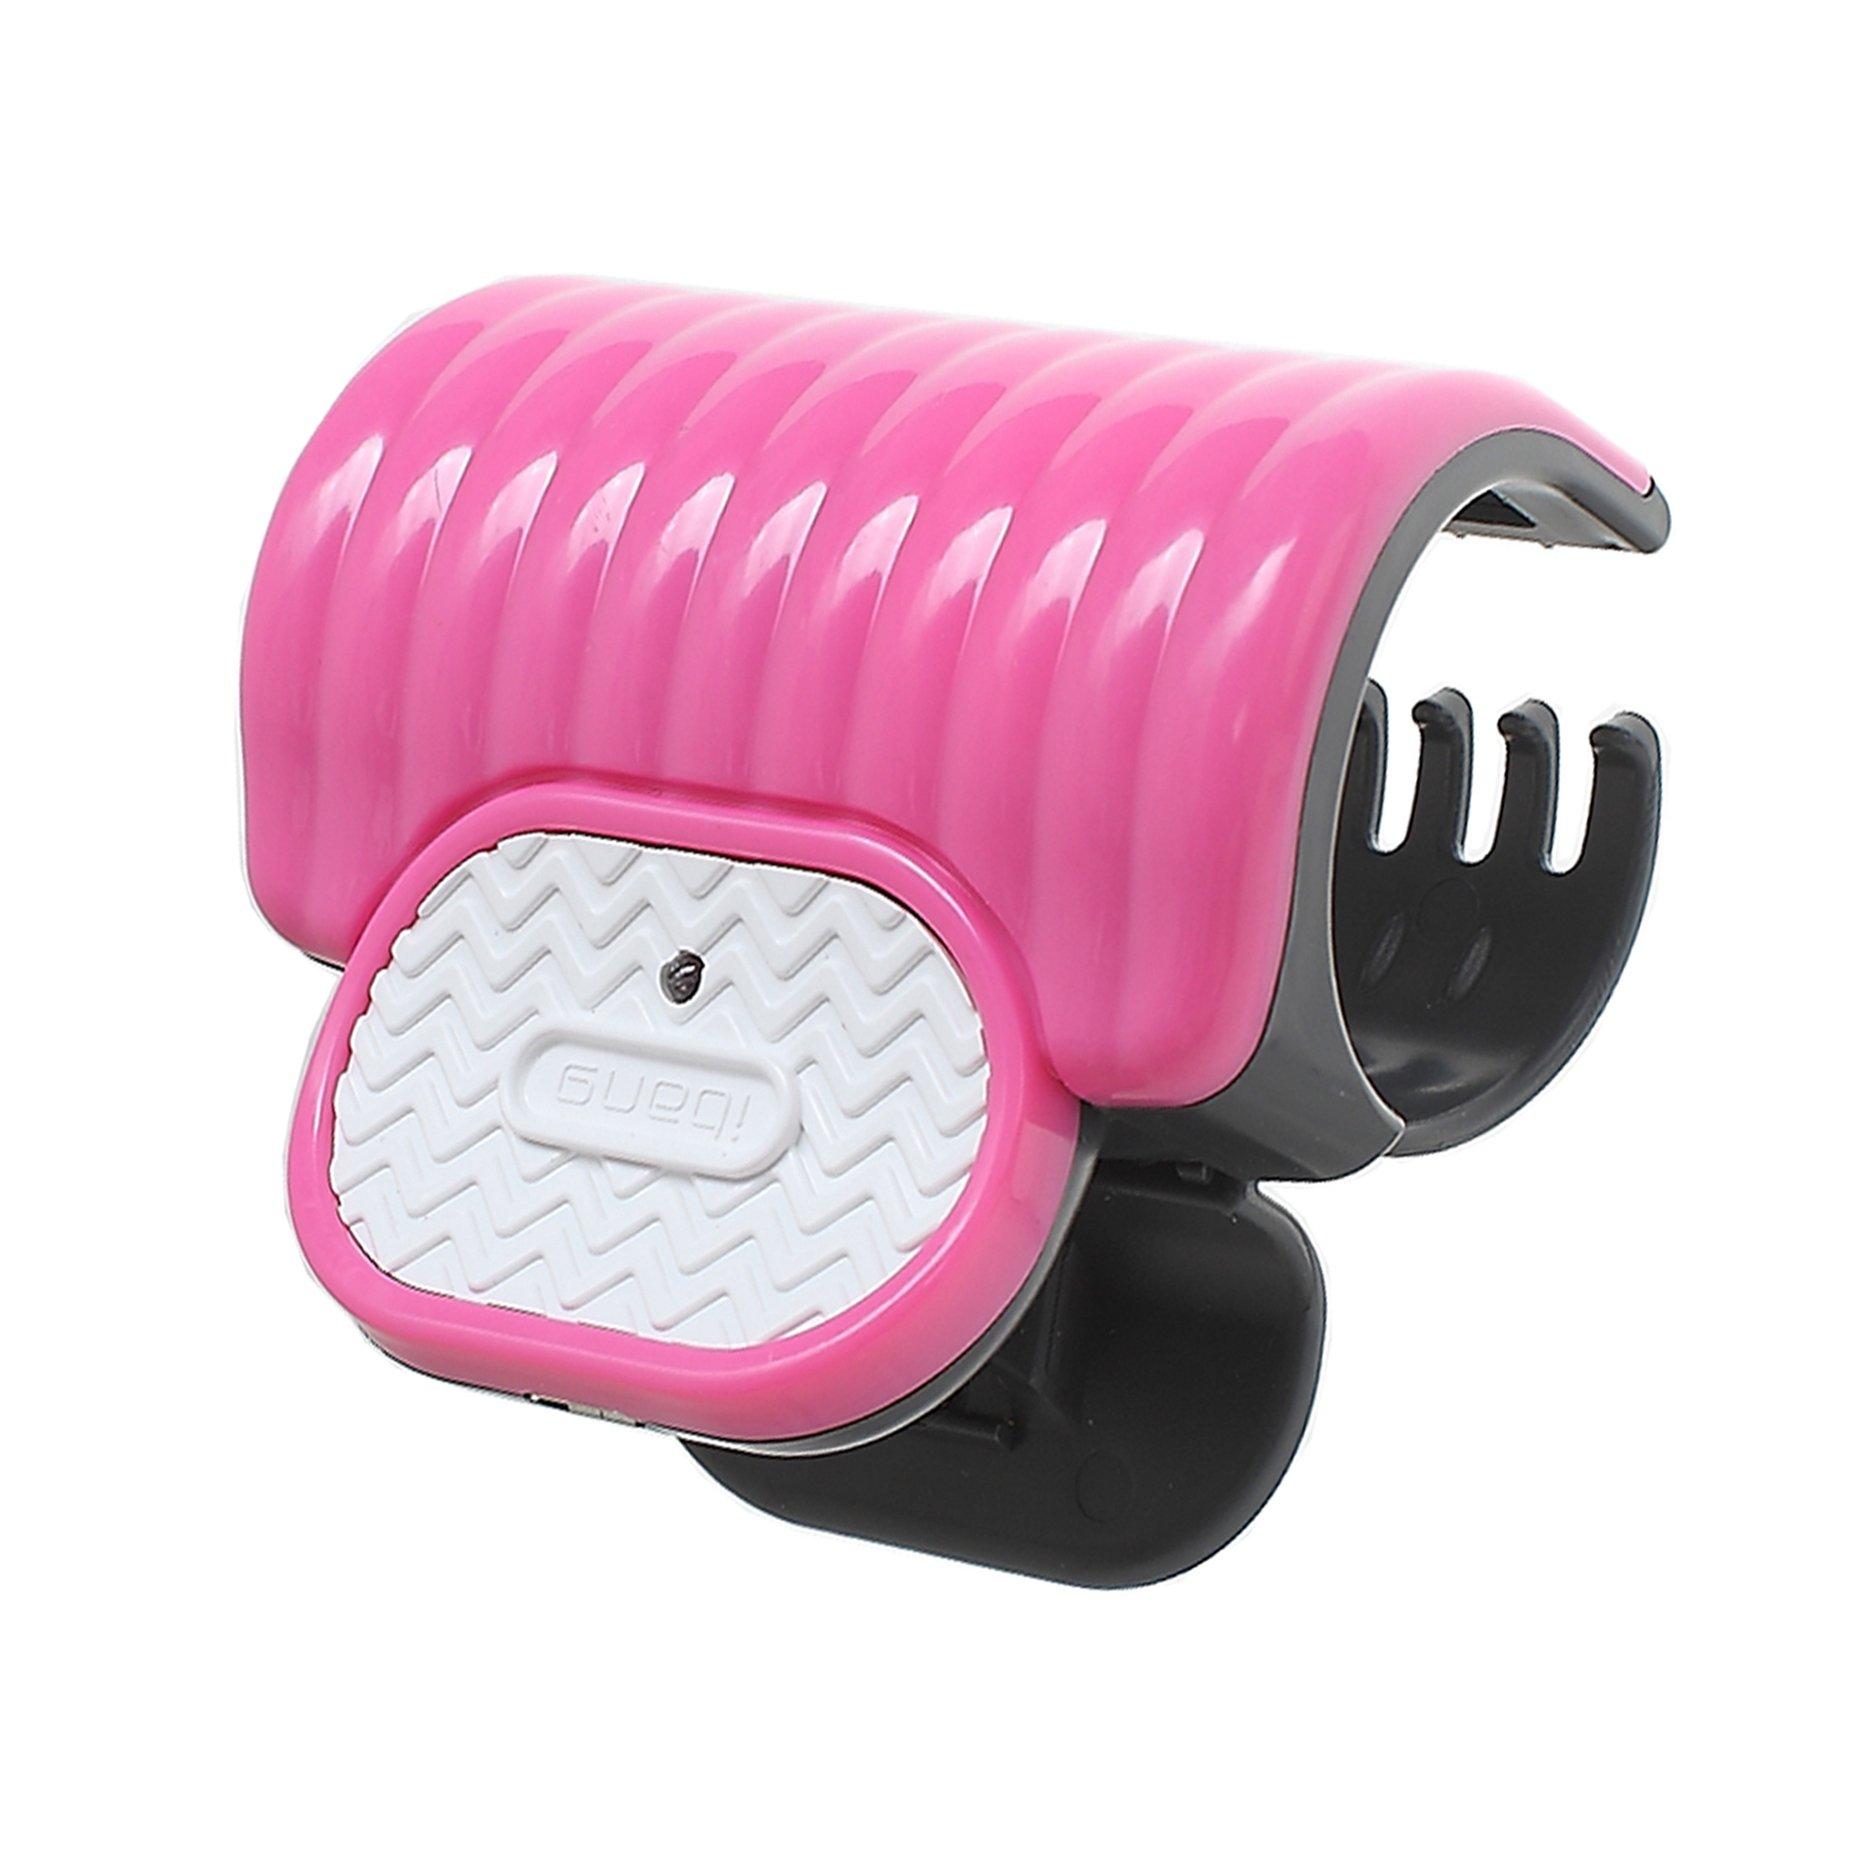 iBang Portable Instant Heat Hot Roller Clip - Natural Wave Hair Bang Curler for Travel Work (Rose Pink)